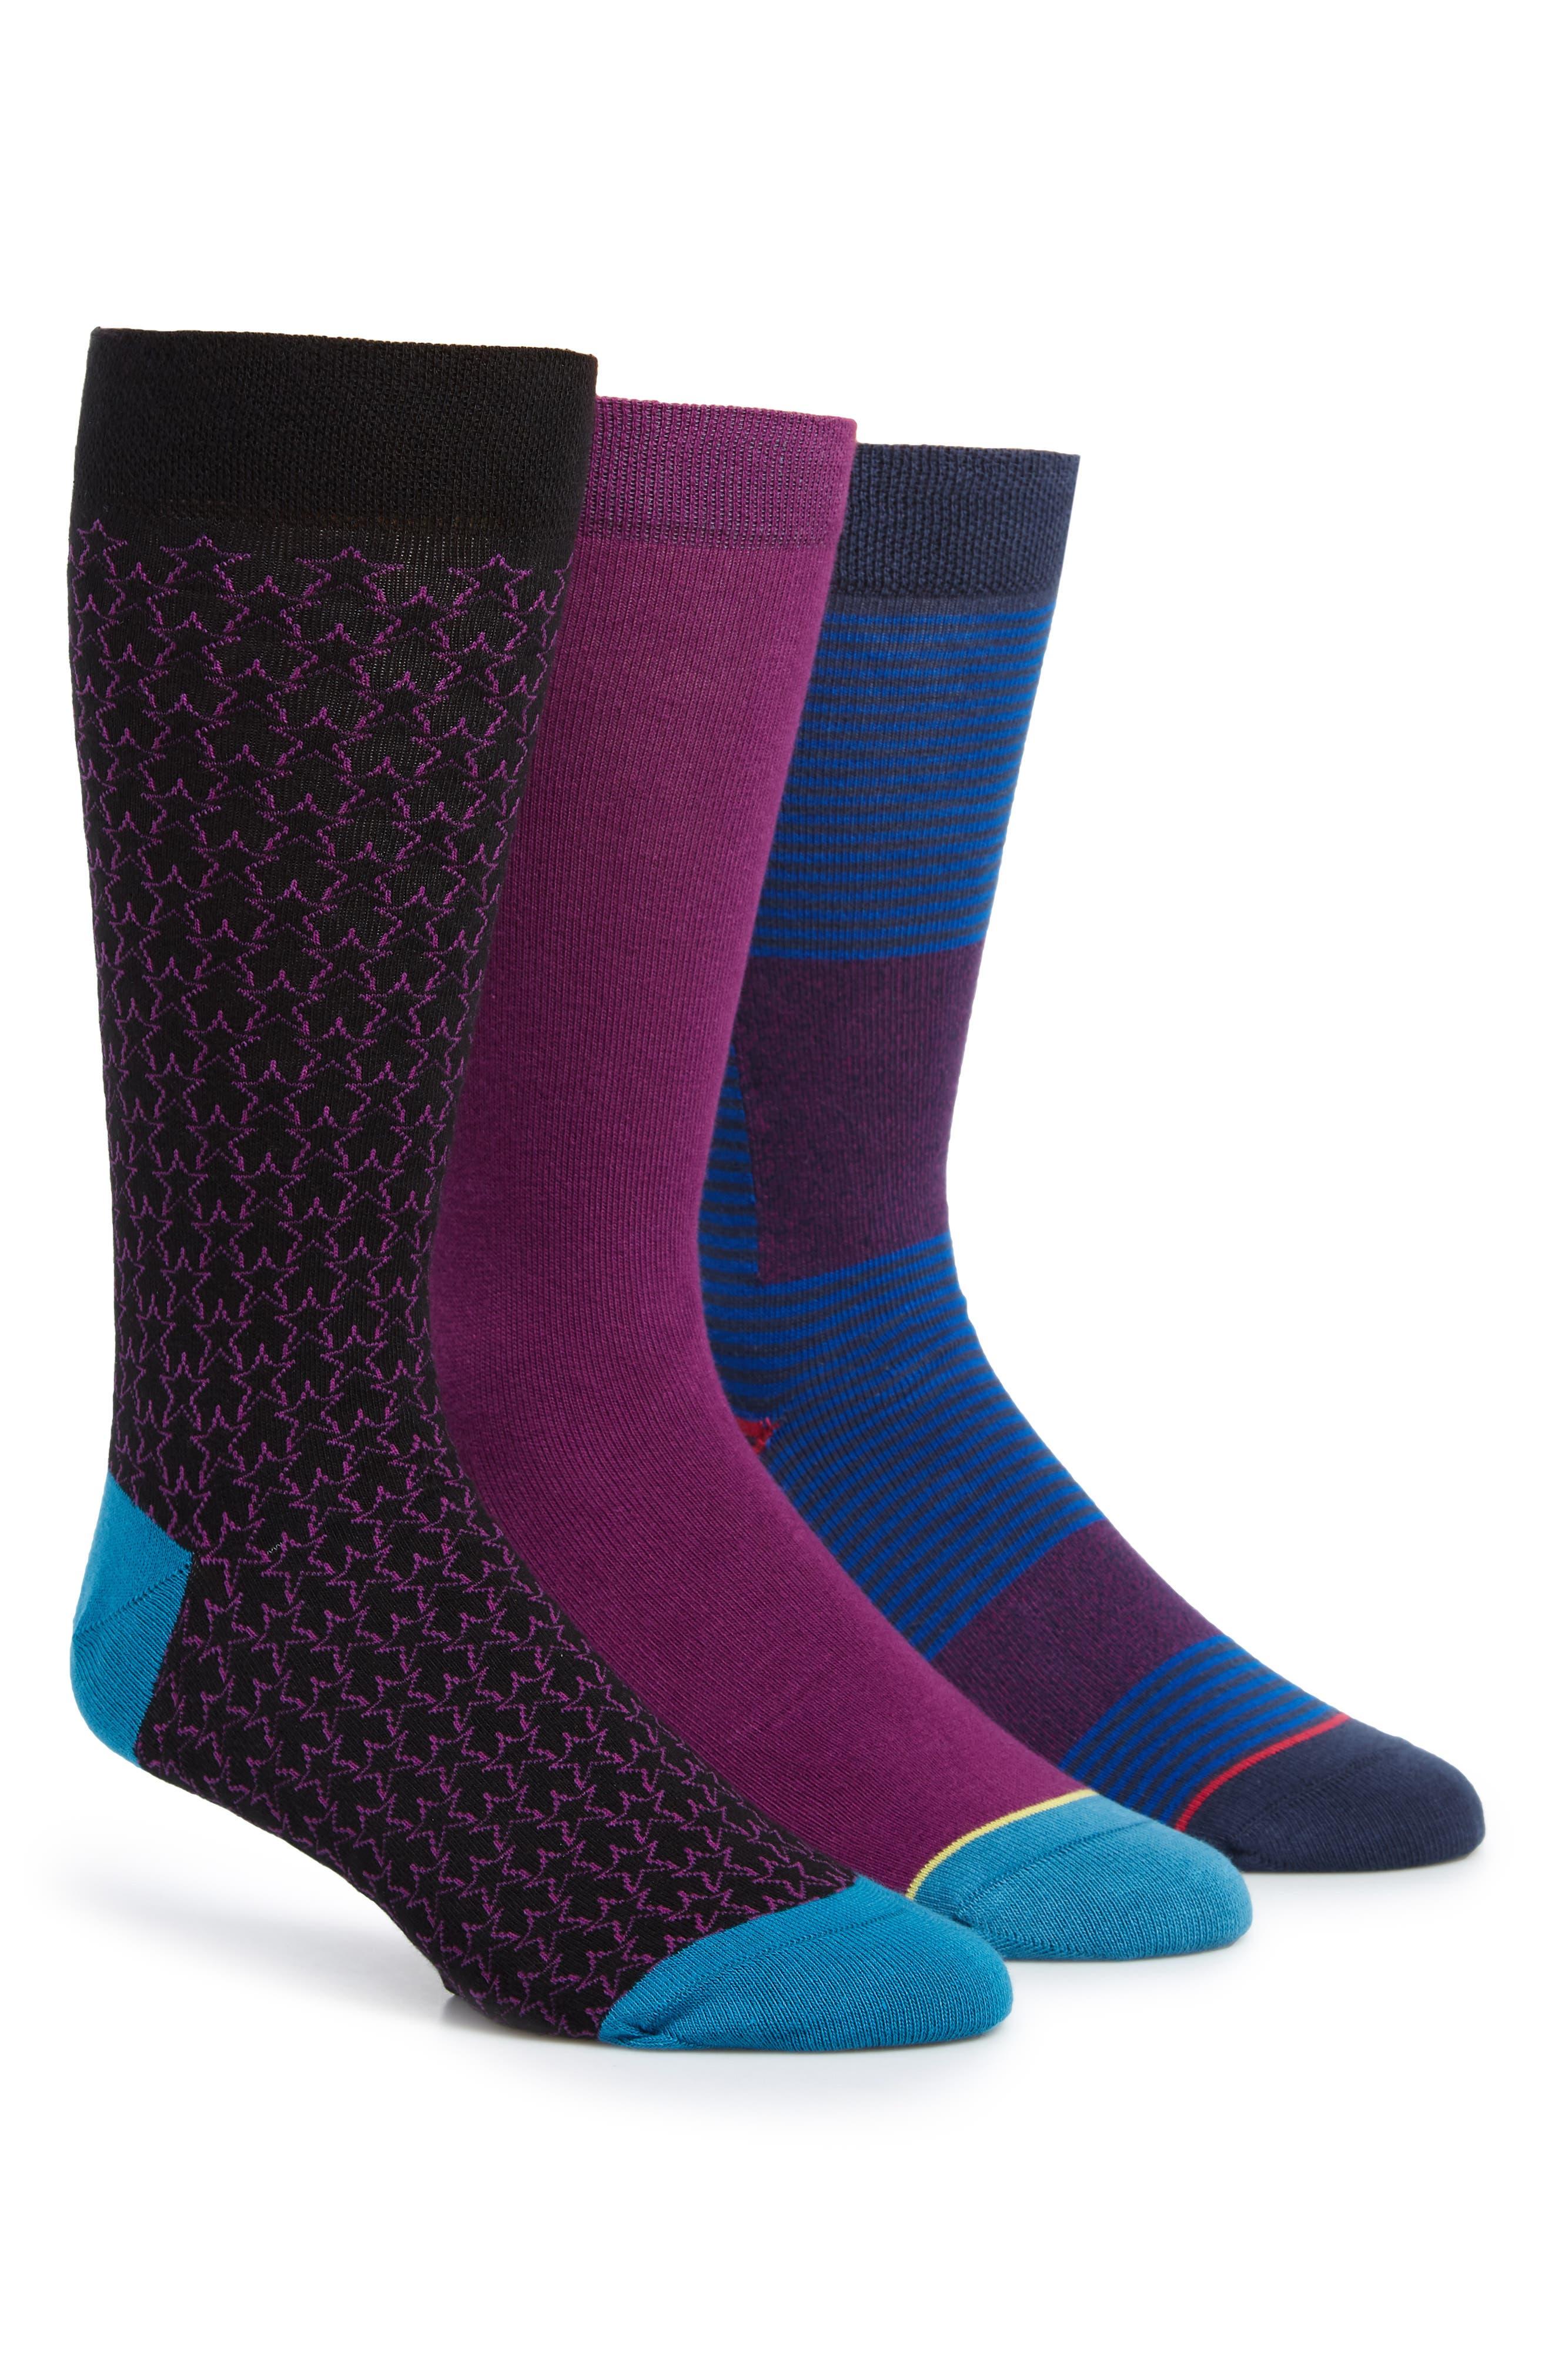 Shnow 3-Pack Socks,                         Main,                         color, PURPLE/ BLUE MULTI